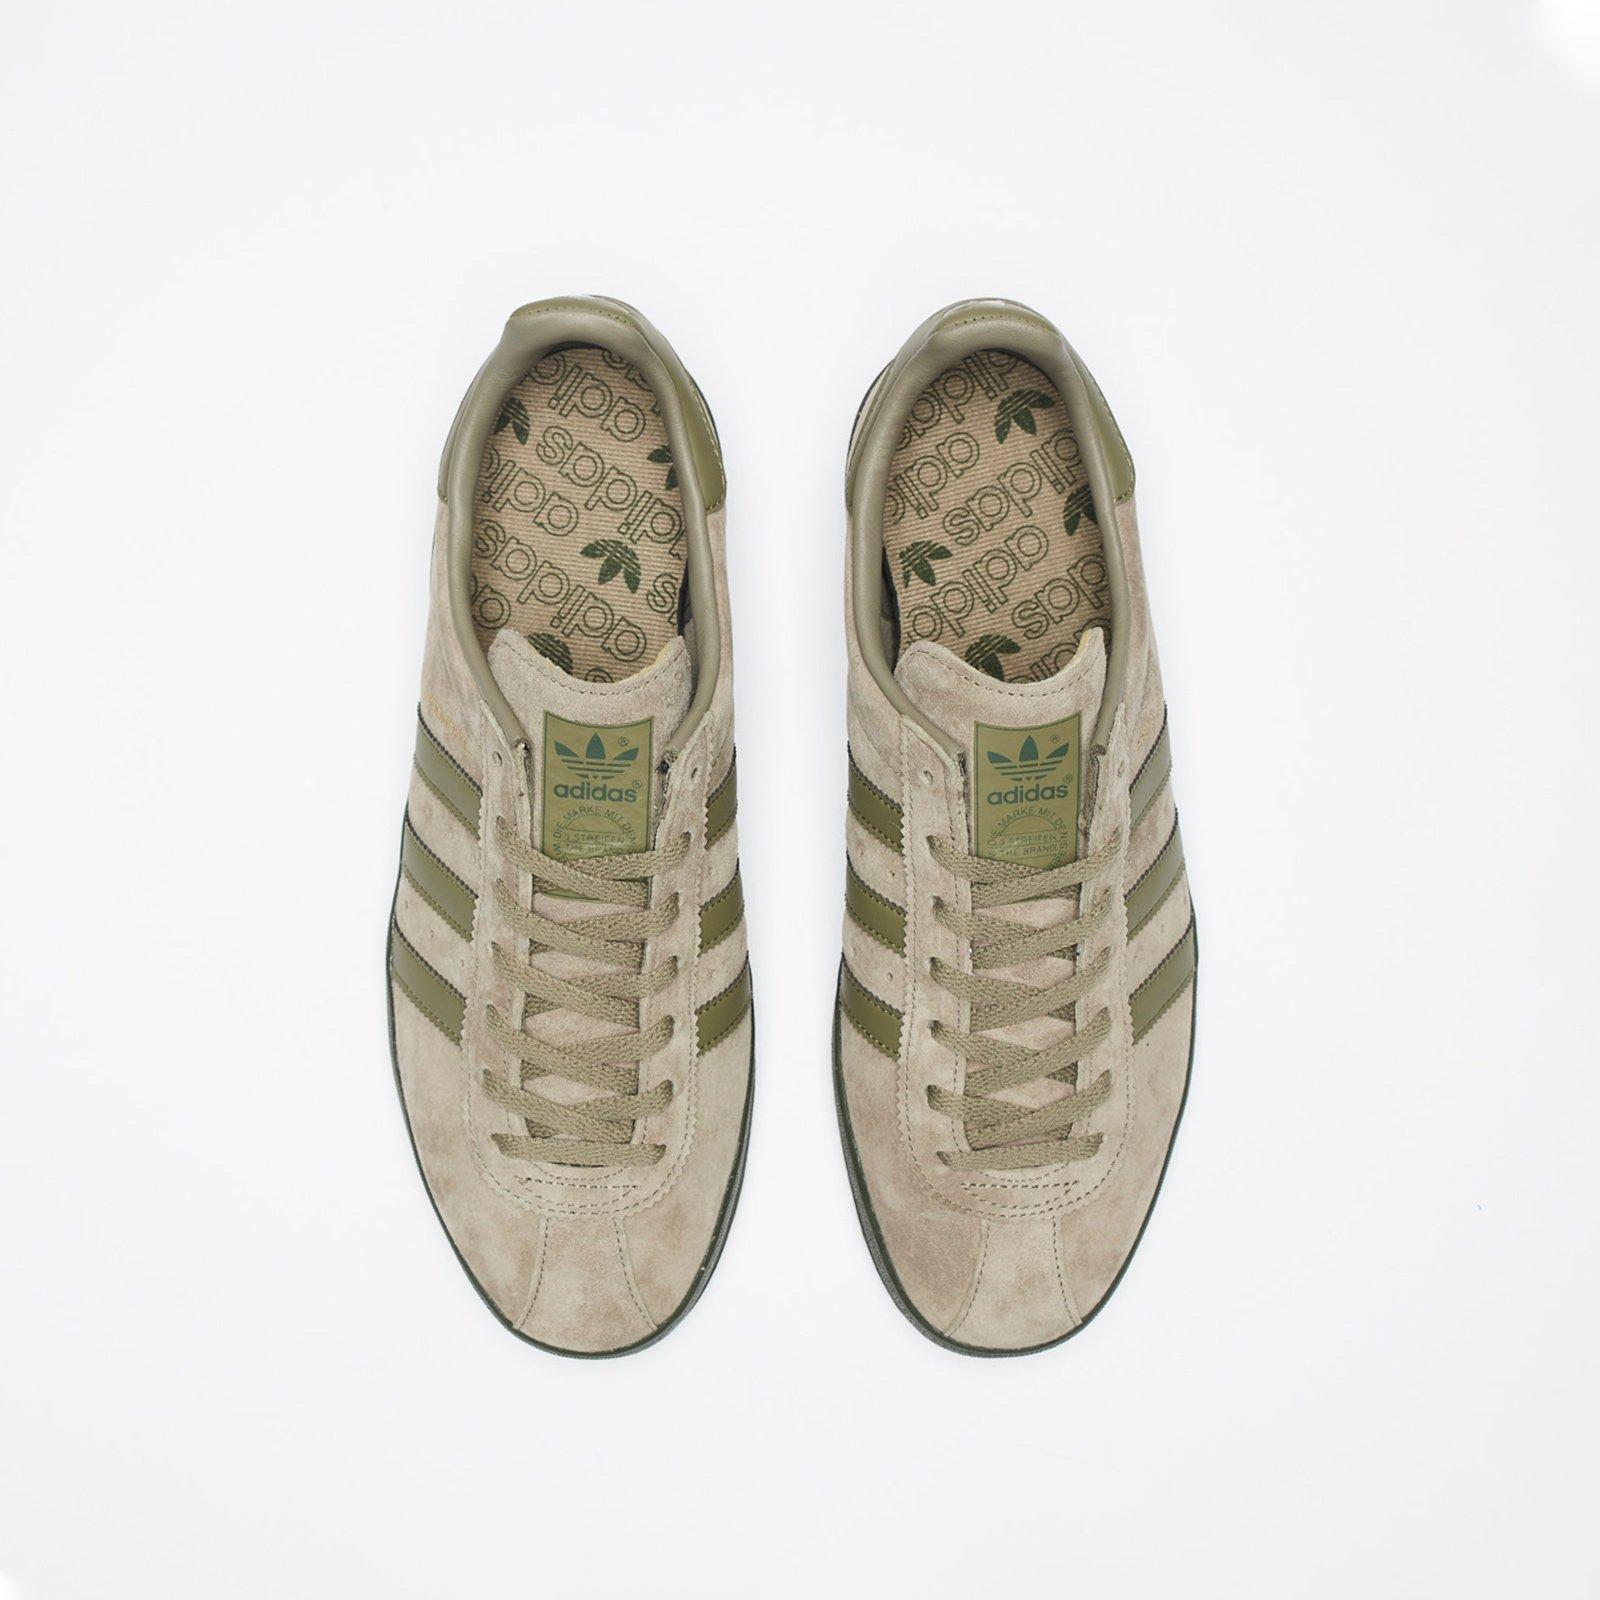 40003c67fbdbc2 adidas Broomfield - Bd7611 - Sneakersnstuff